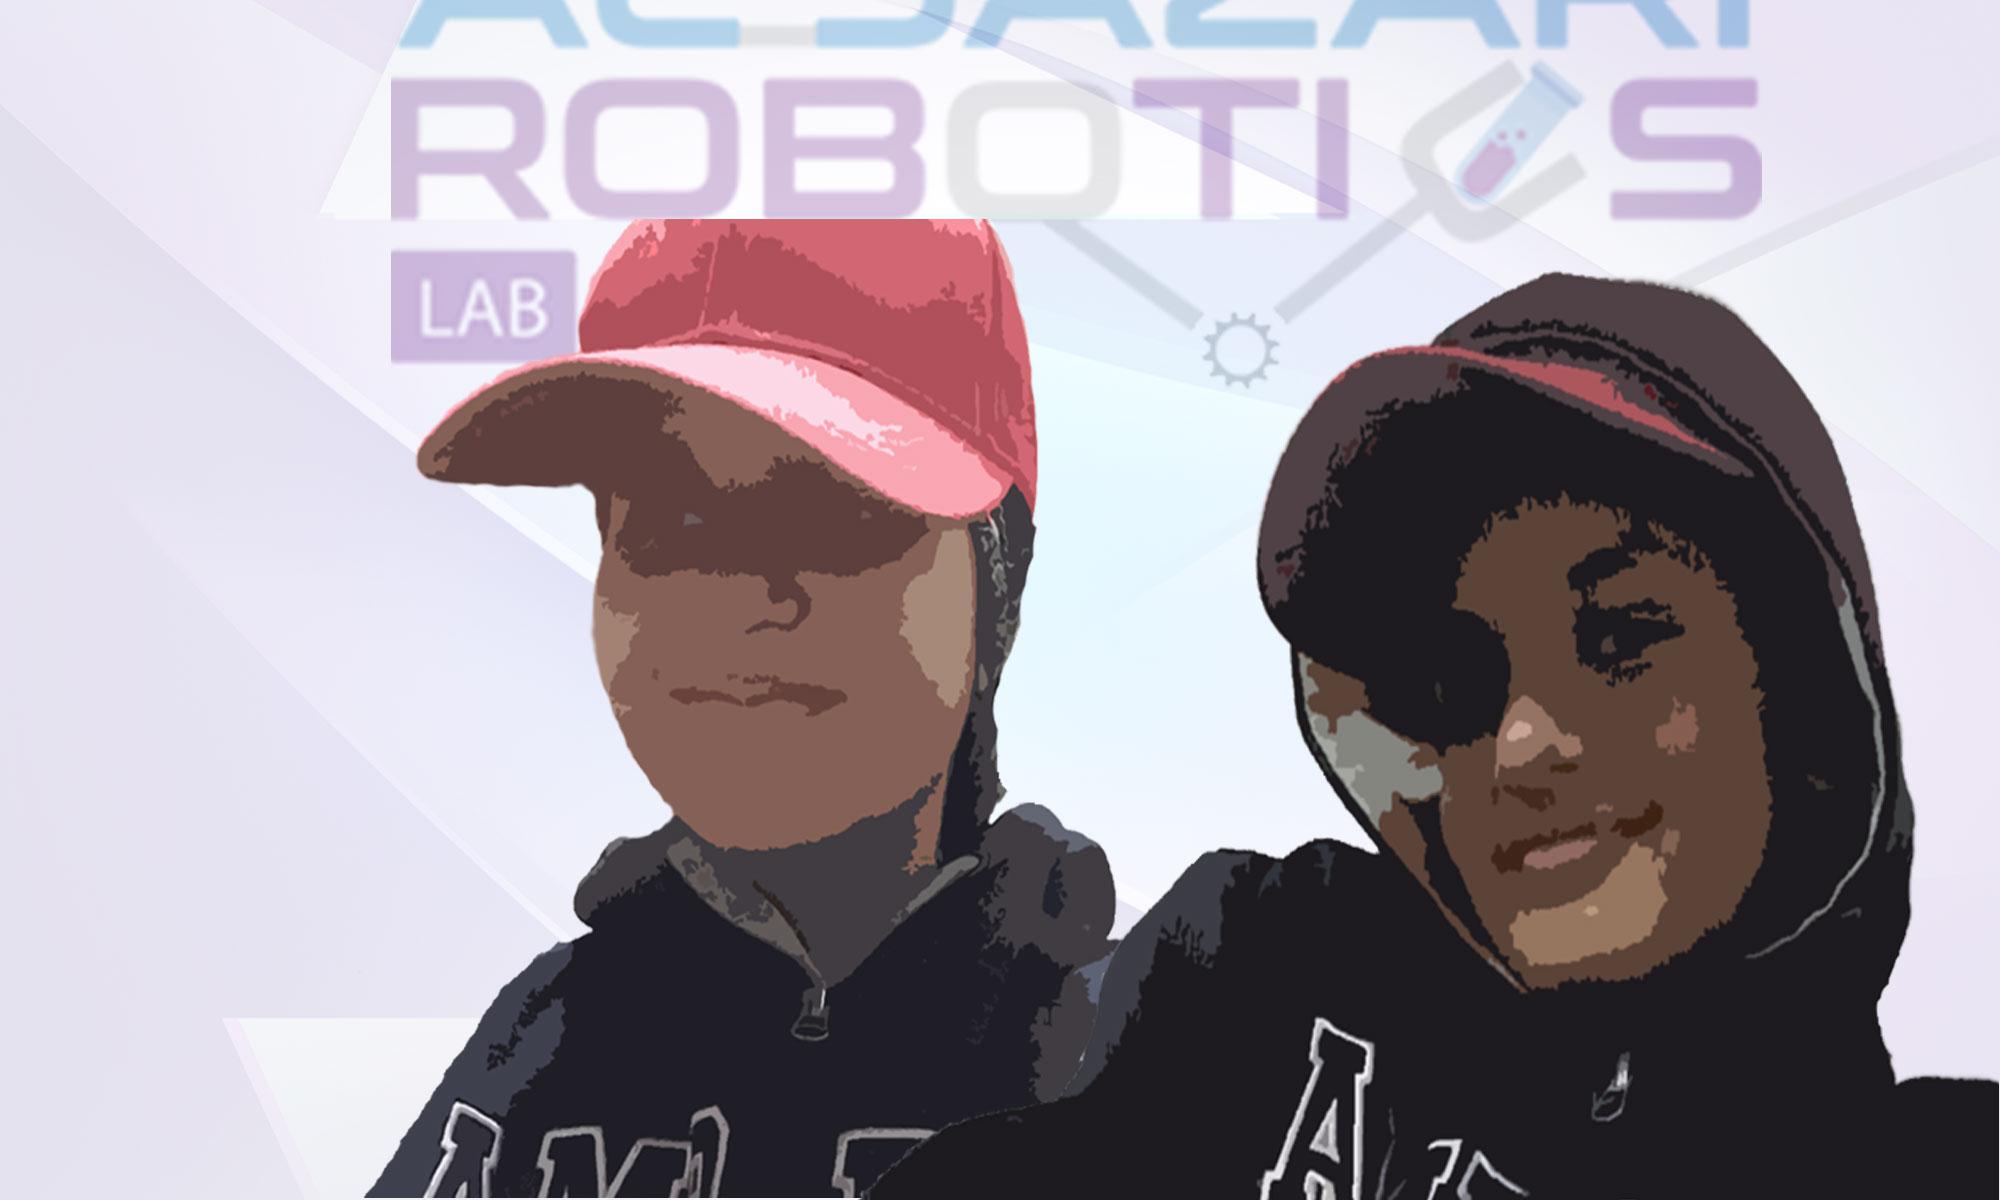 Al Jazari Robotics